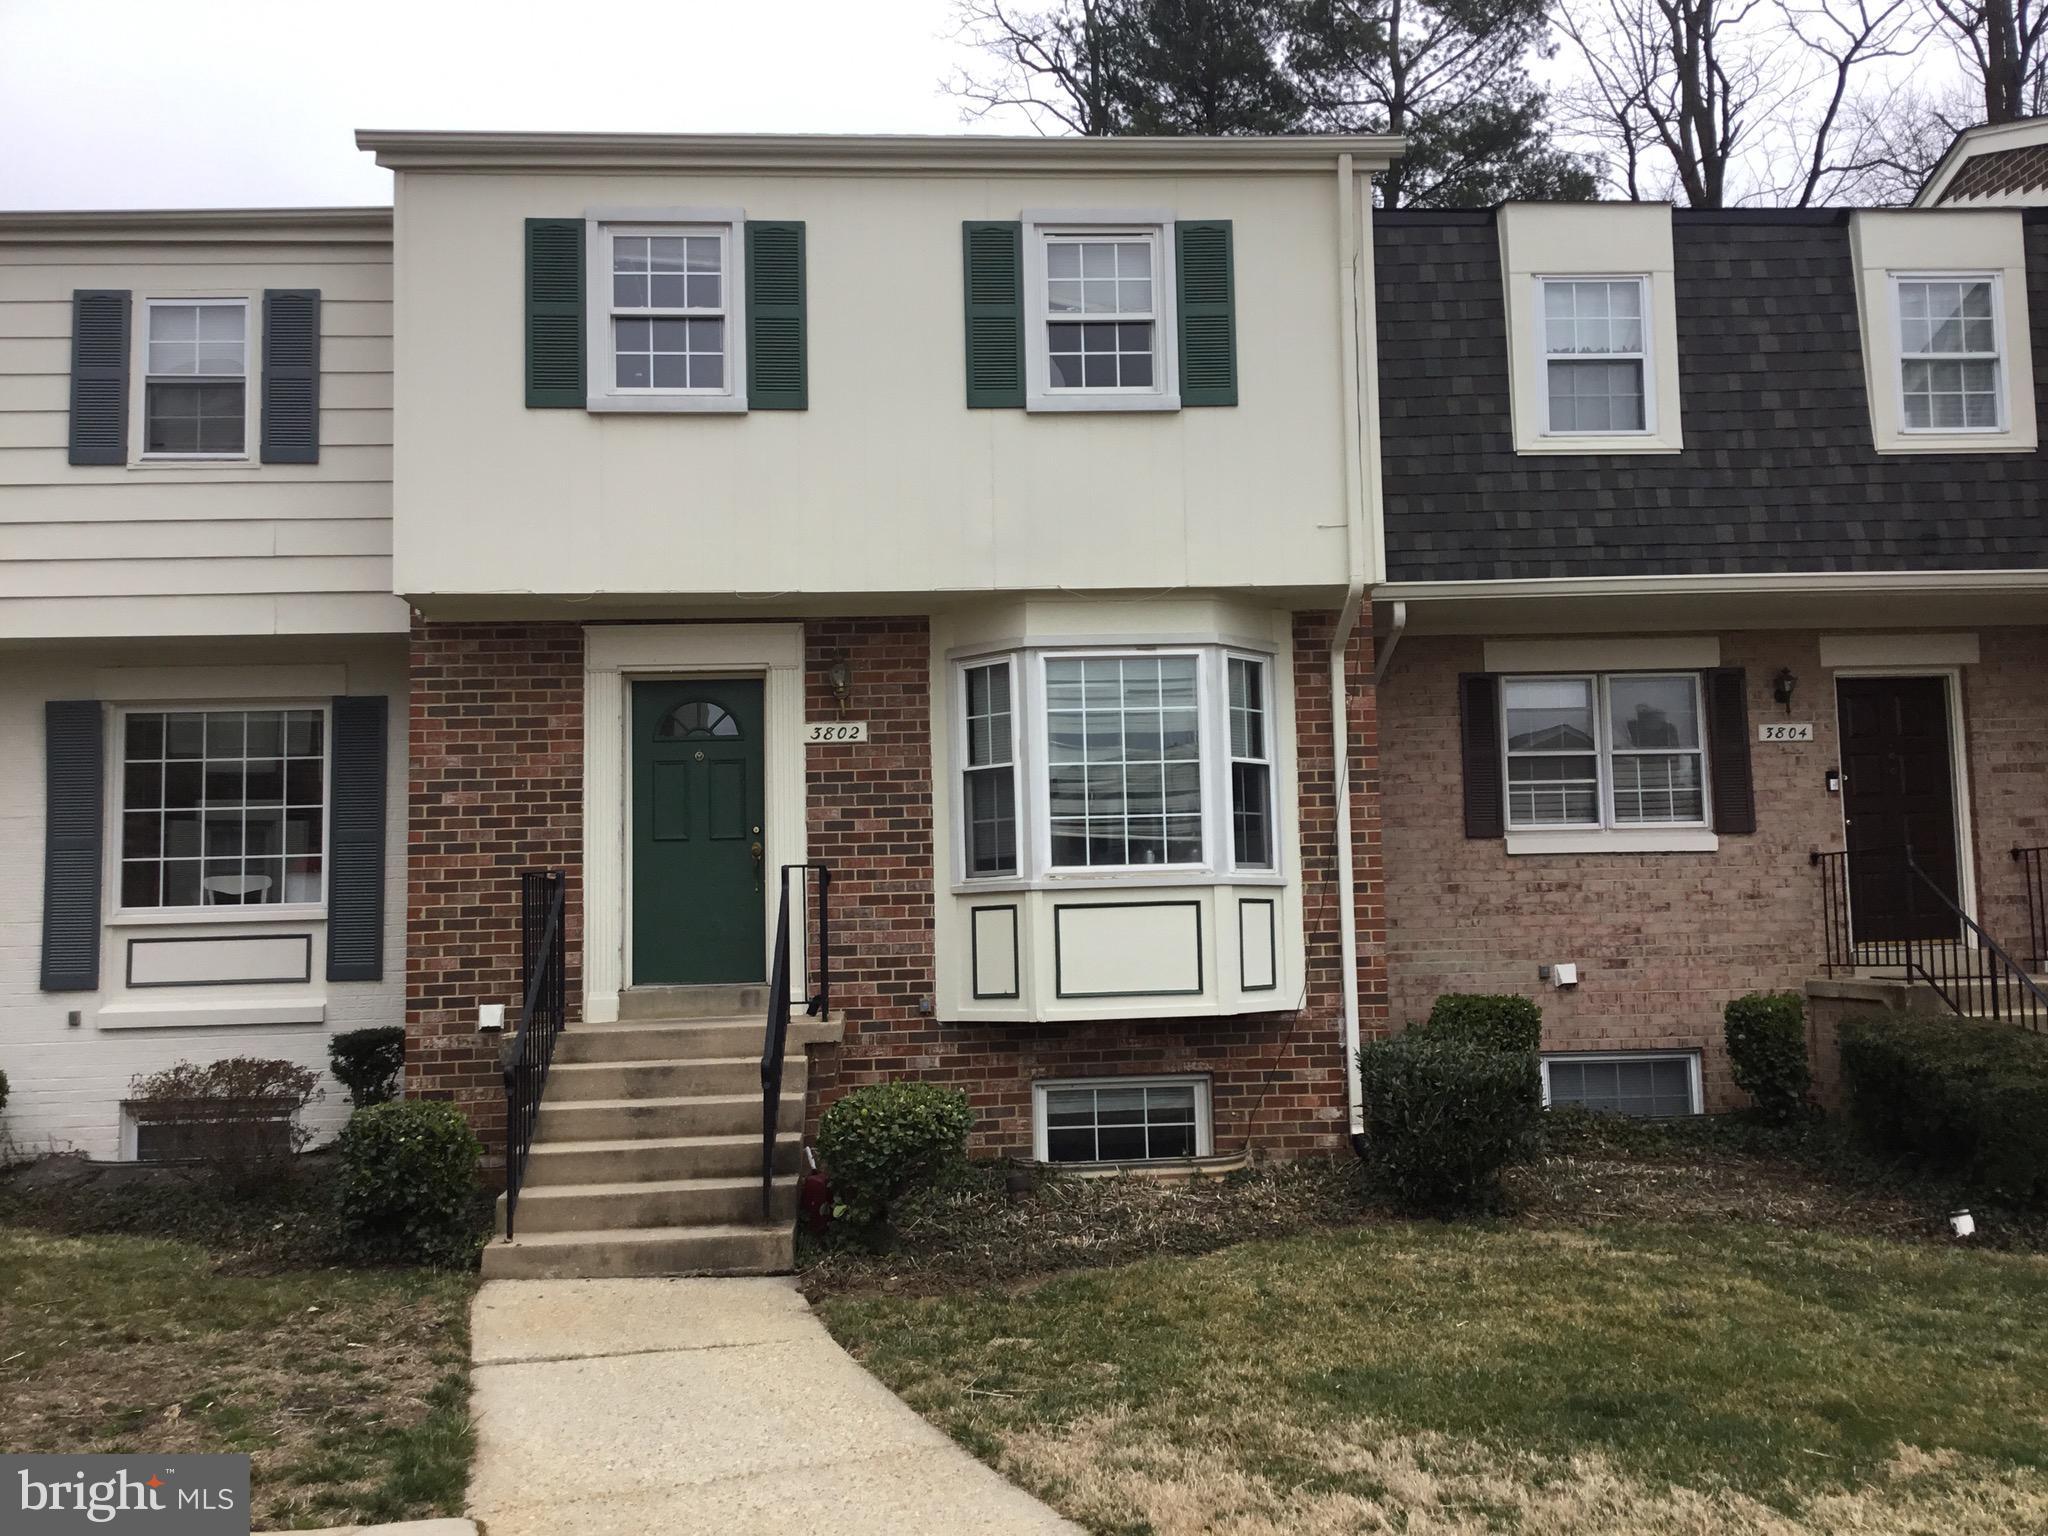 3802 TREMAYNE TERRACE, SILVER SPRING, Maryland 20906, 4 Bedrooms Bedrooms, ,4 BathroomsBathrooms,Condominium,For Sale,3802 TREMAYNE TERRACE,MDMC749528